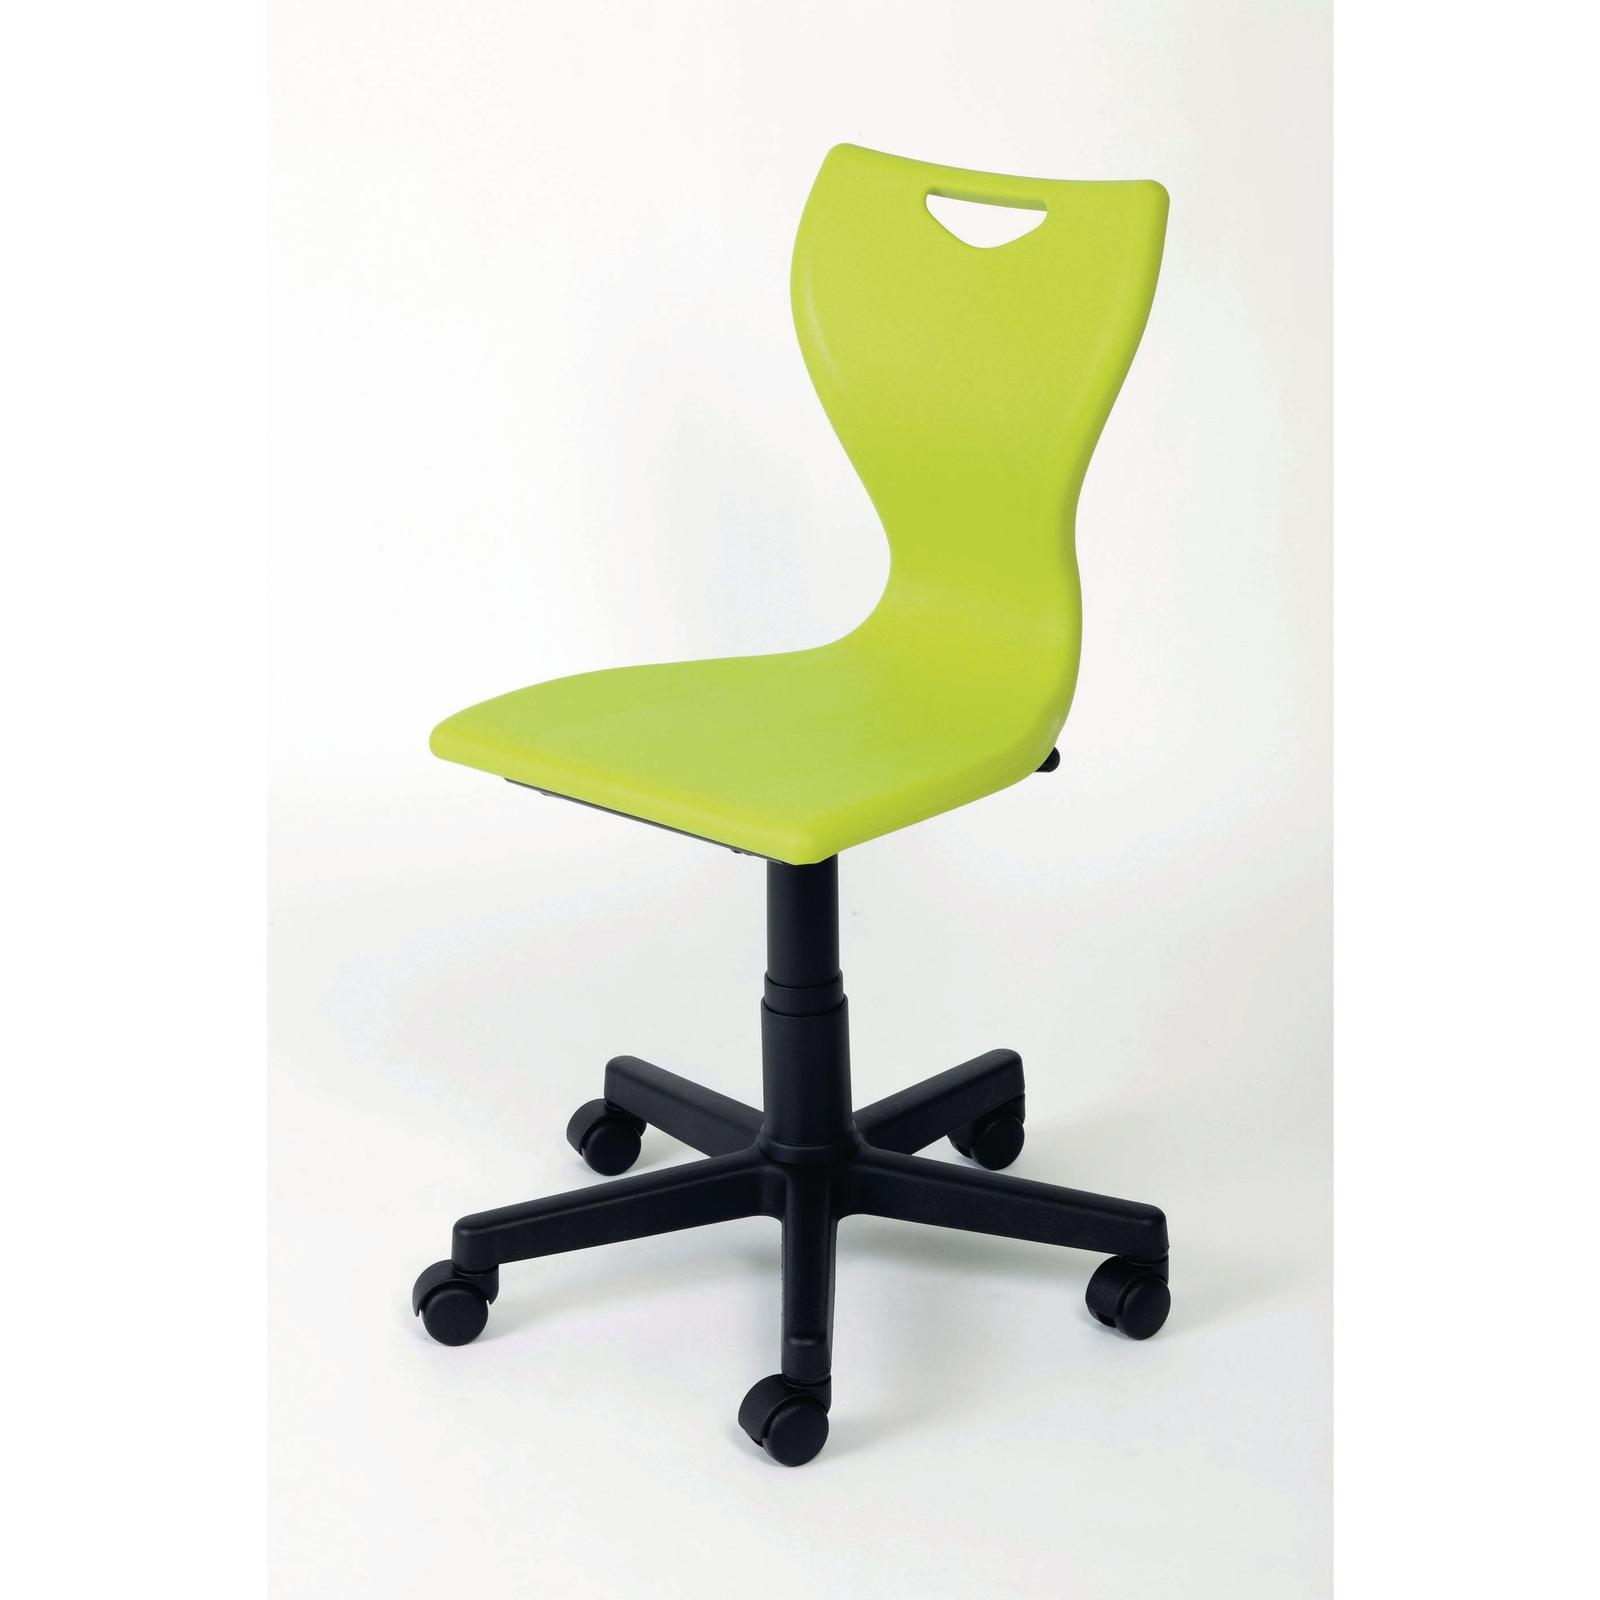 En50 Computer Chair Black Castors Orange